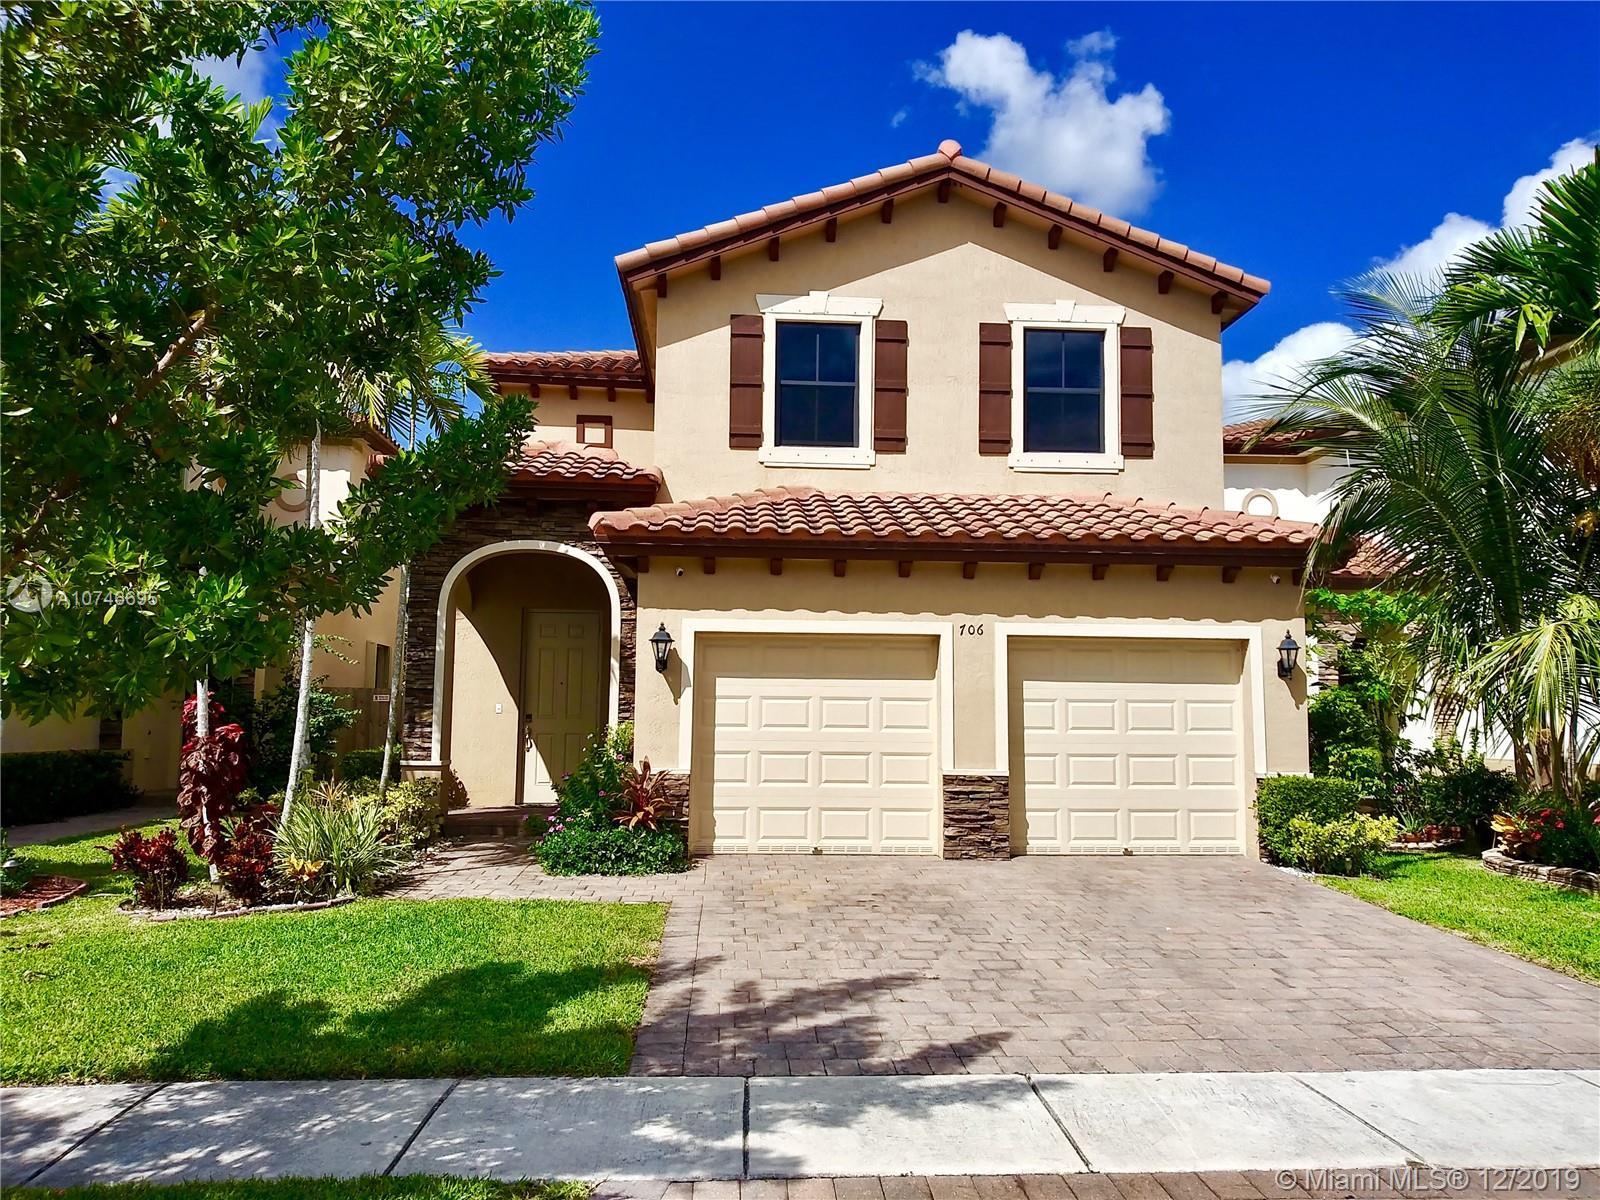 706 SE 34th Ter, Homestead, FL 33033 - Homestead, FL real estate listing